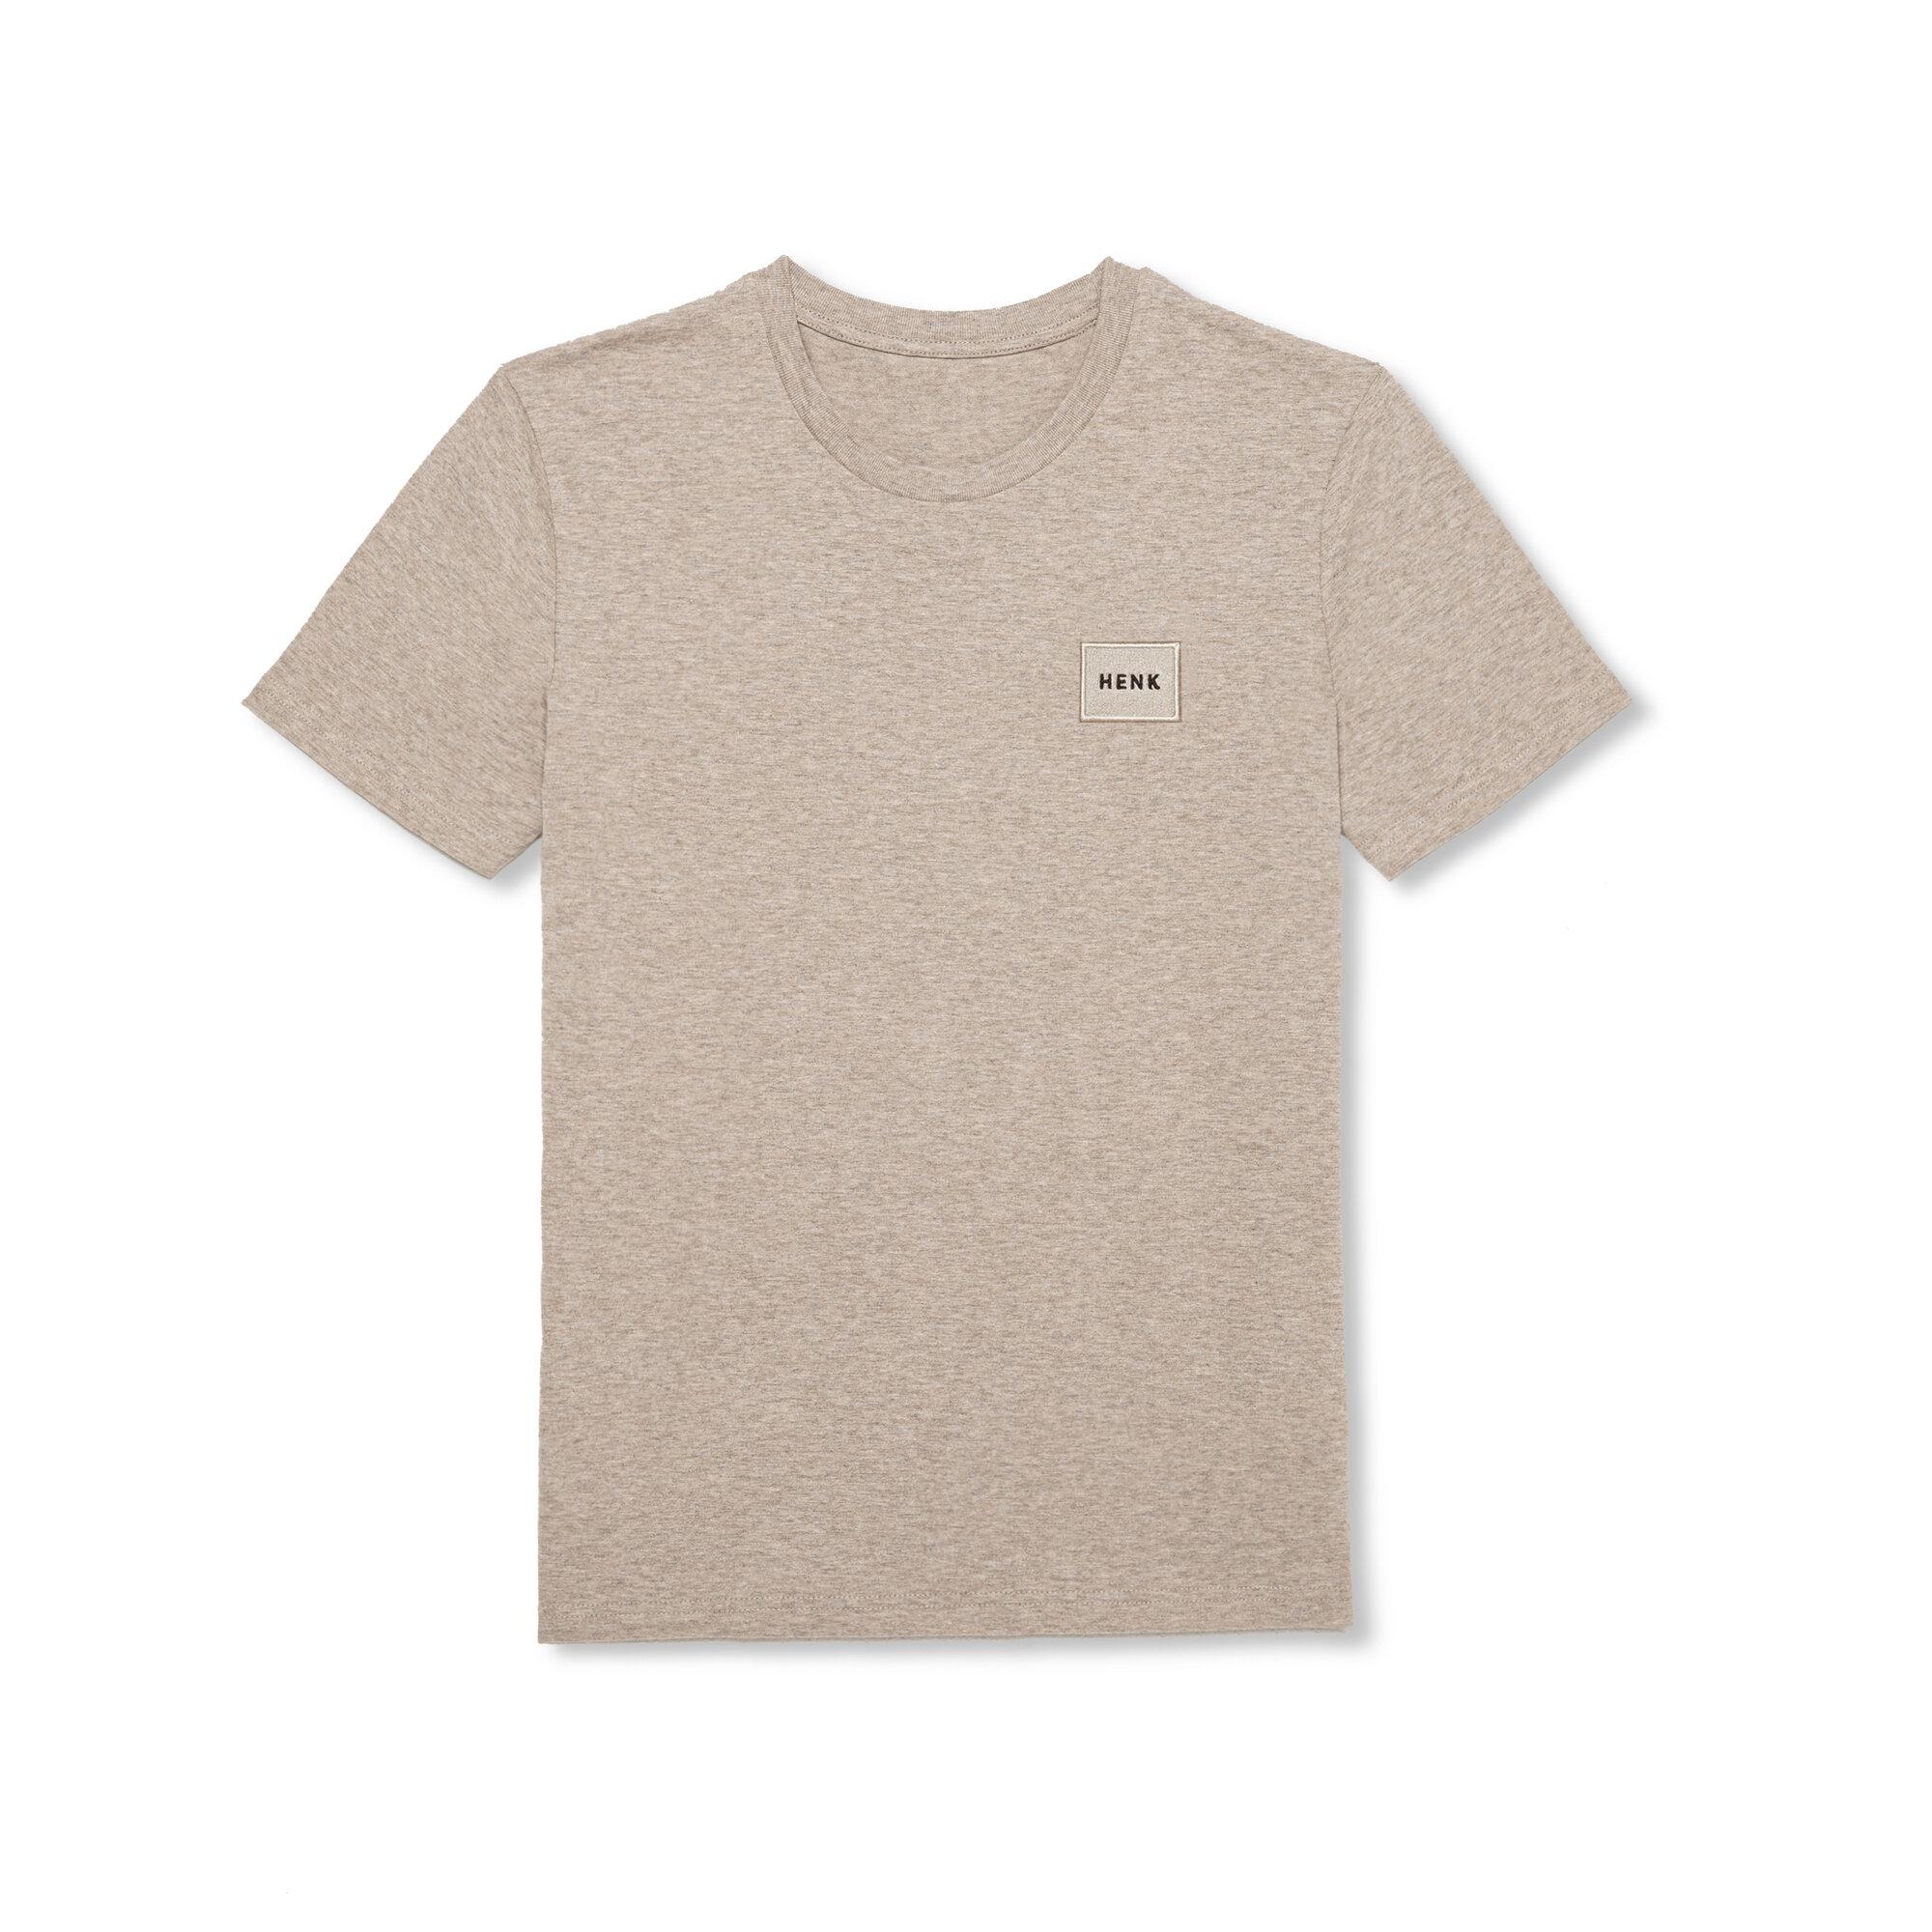 T-shirt | Beige Melange | Studio HENK | Listing_image